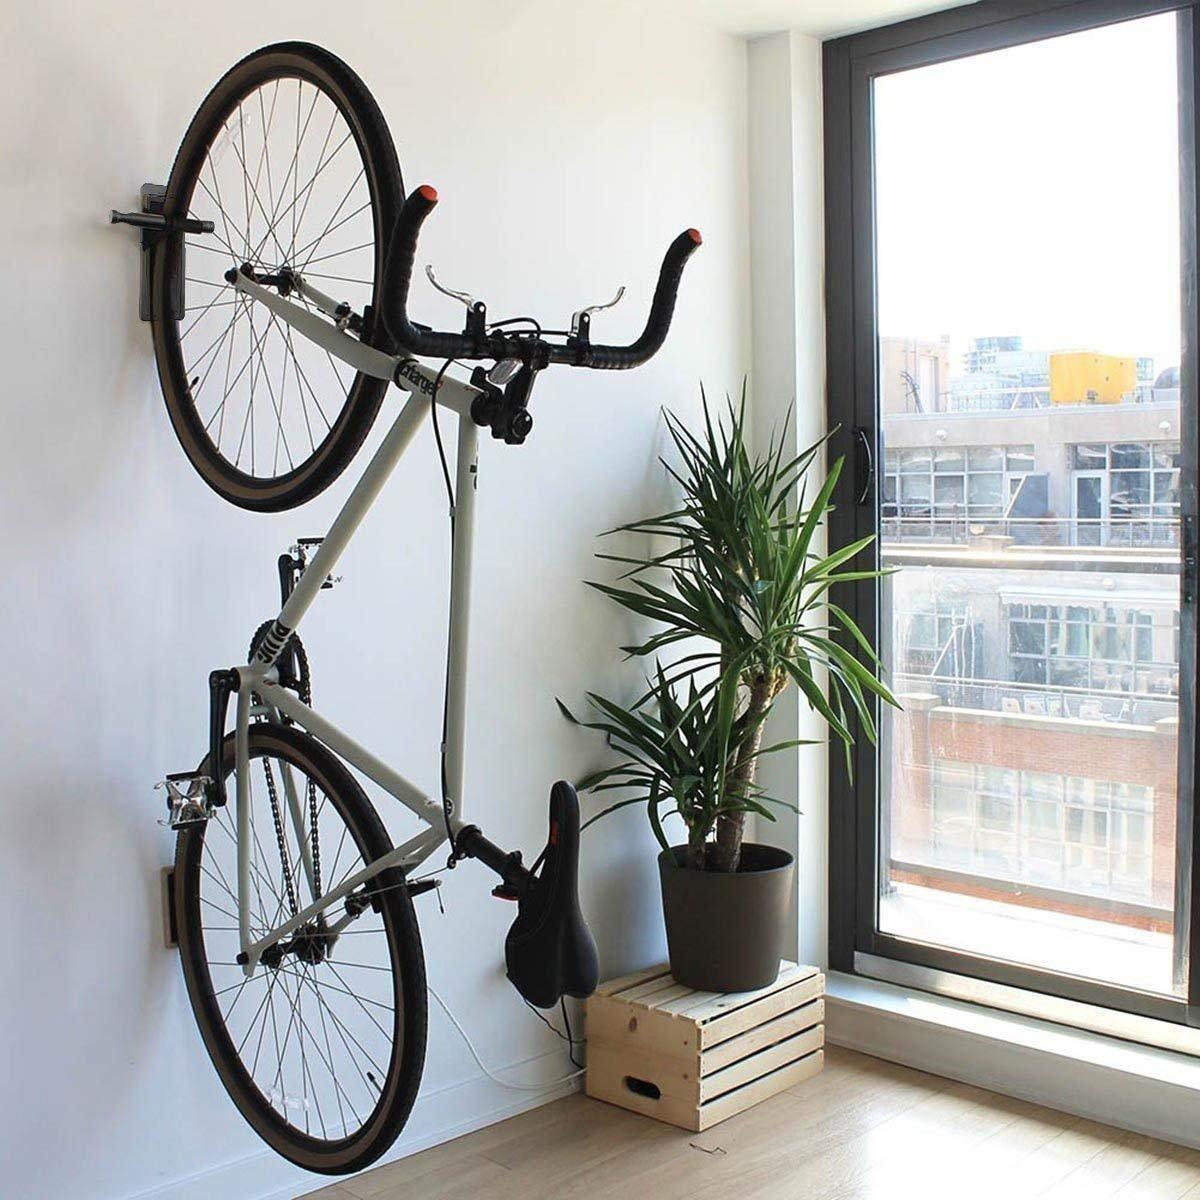 Maxfind Pedal Hook Deluxe Bike Rack Garage Wall Mount Bike Hanger Storage Horizontal Hook Storage Indoor 3 in 1